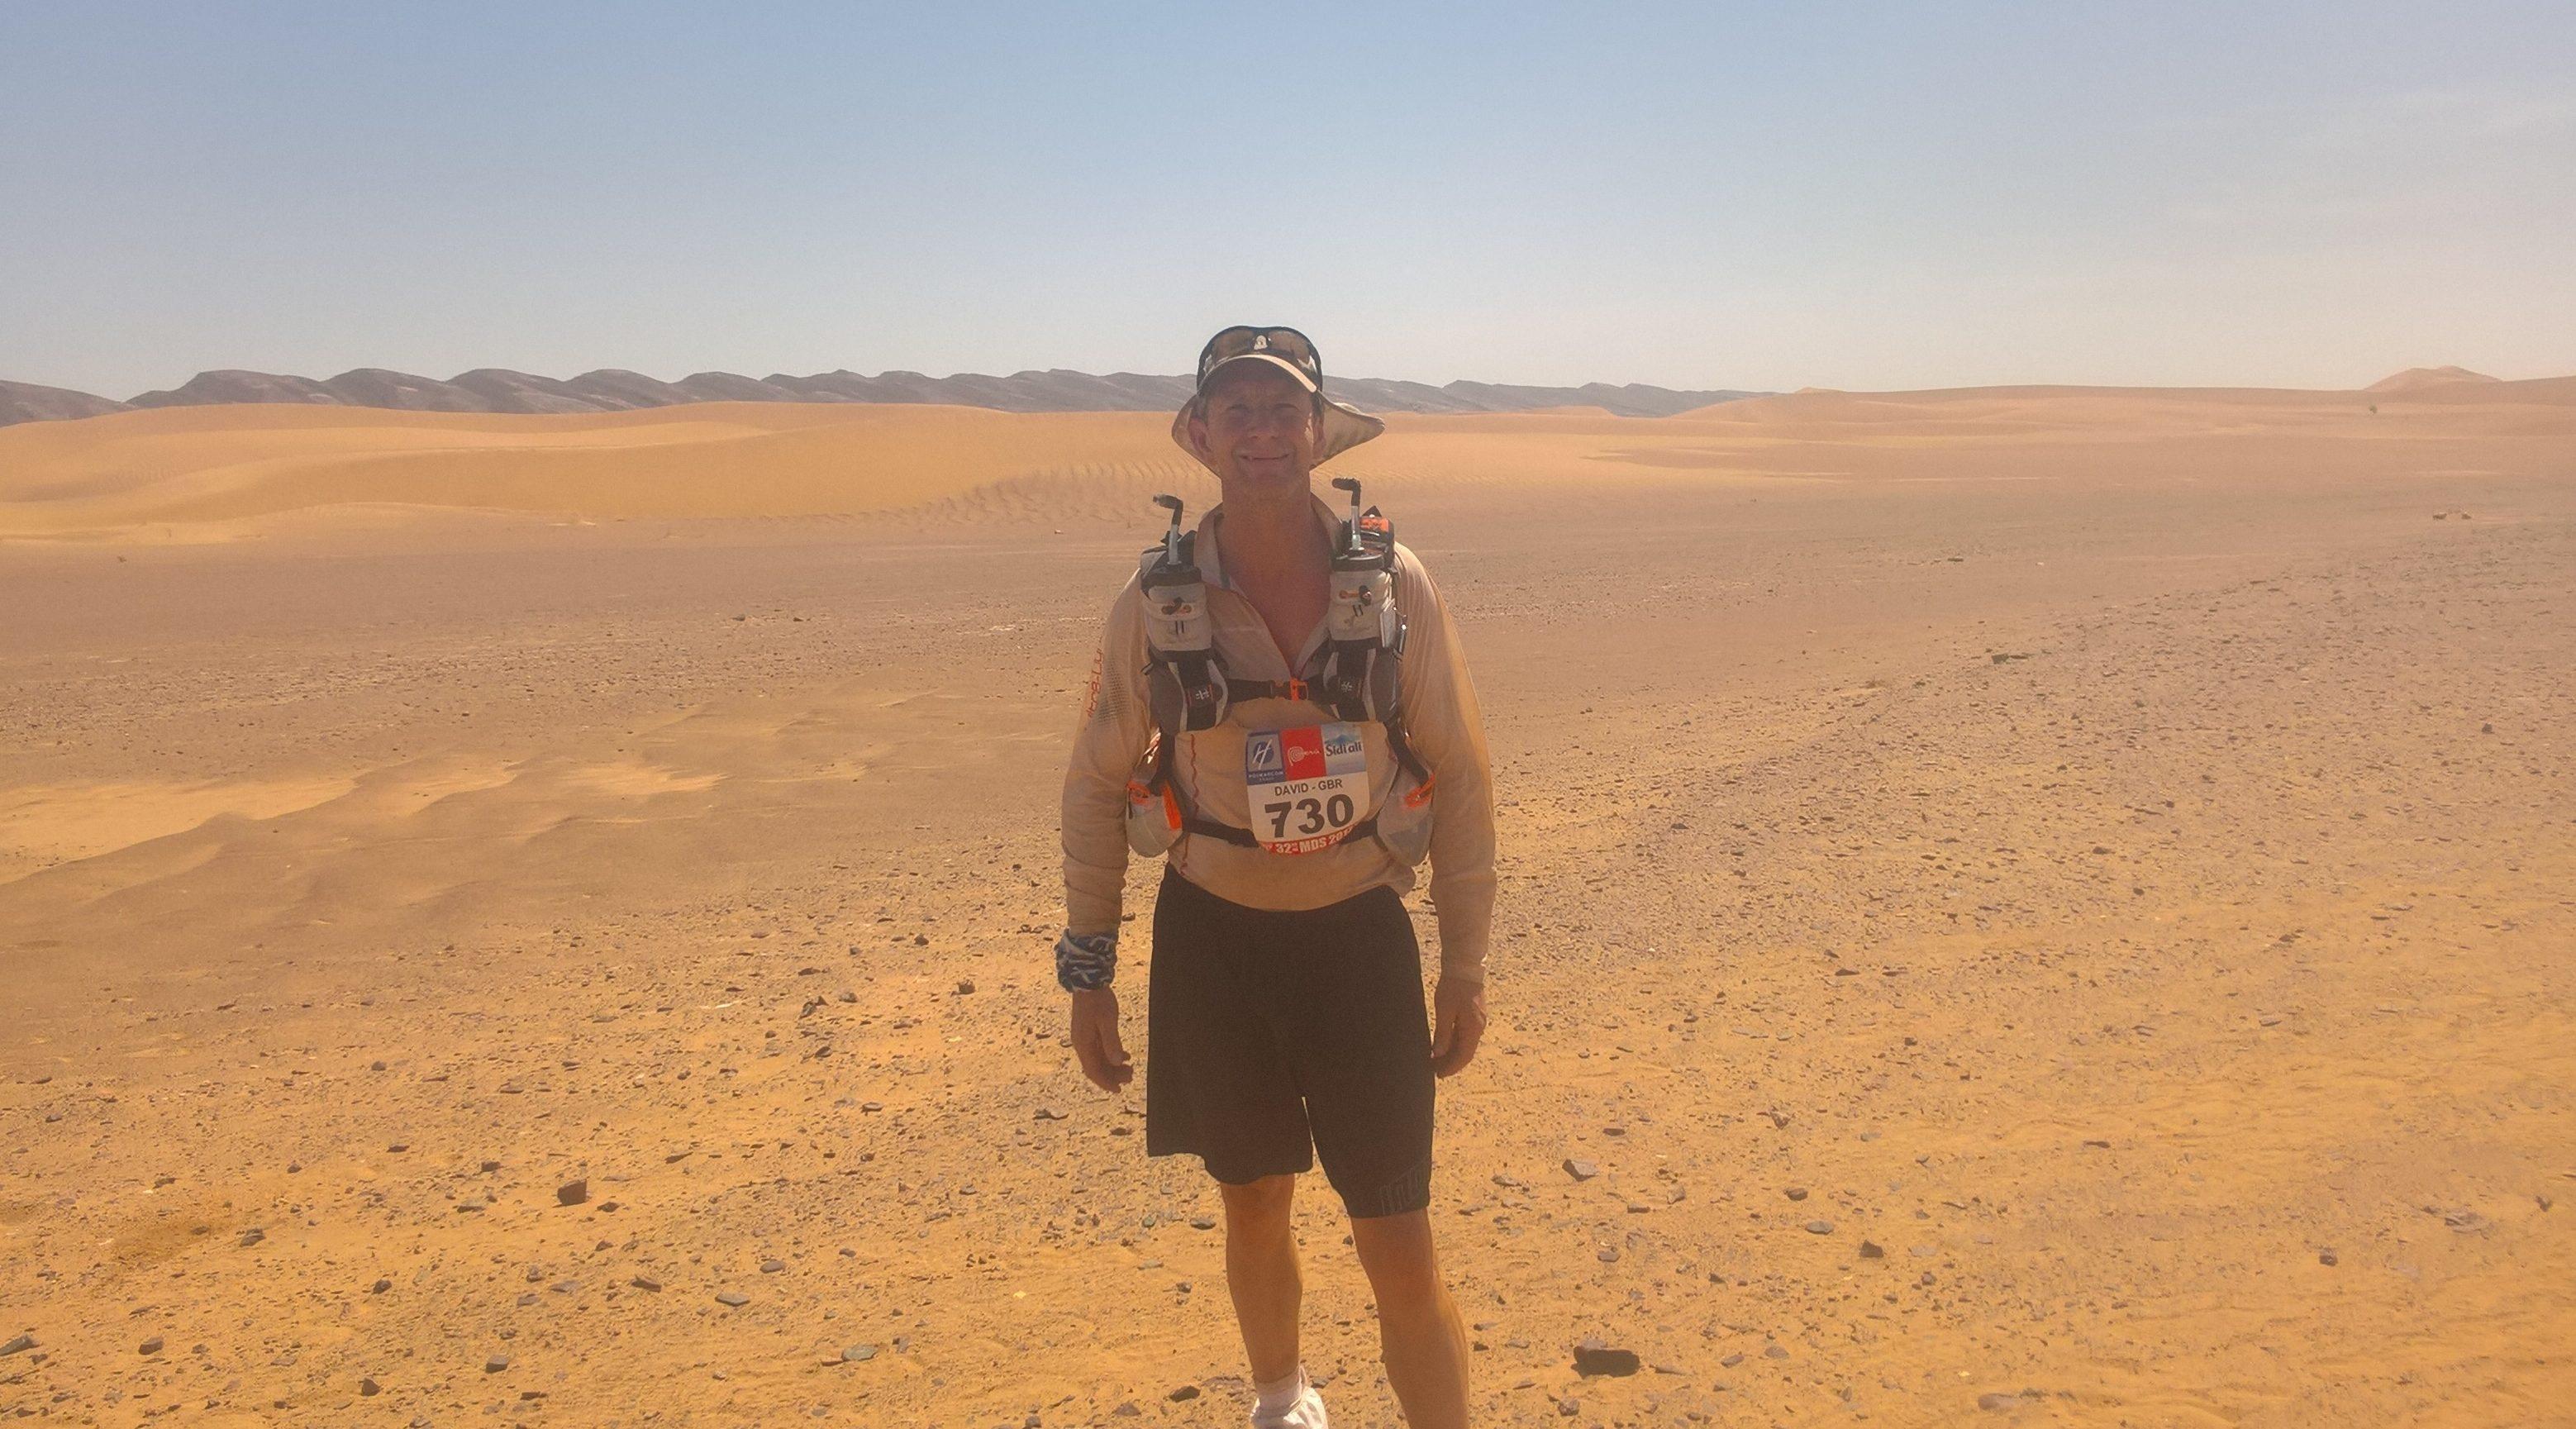 David in the Sahara